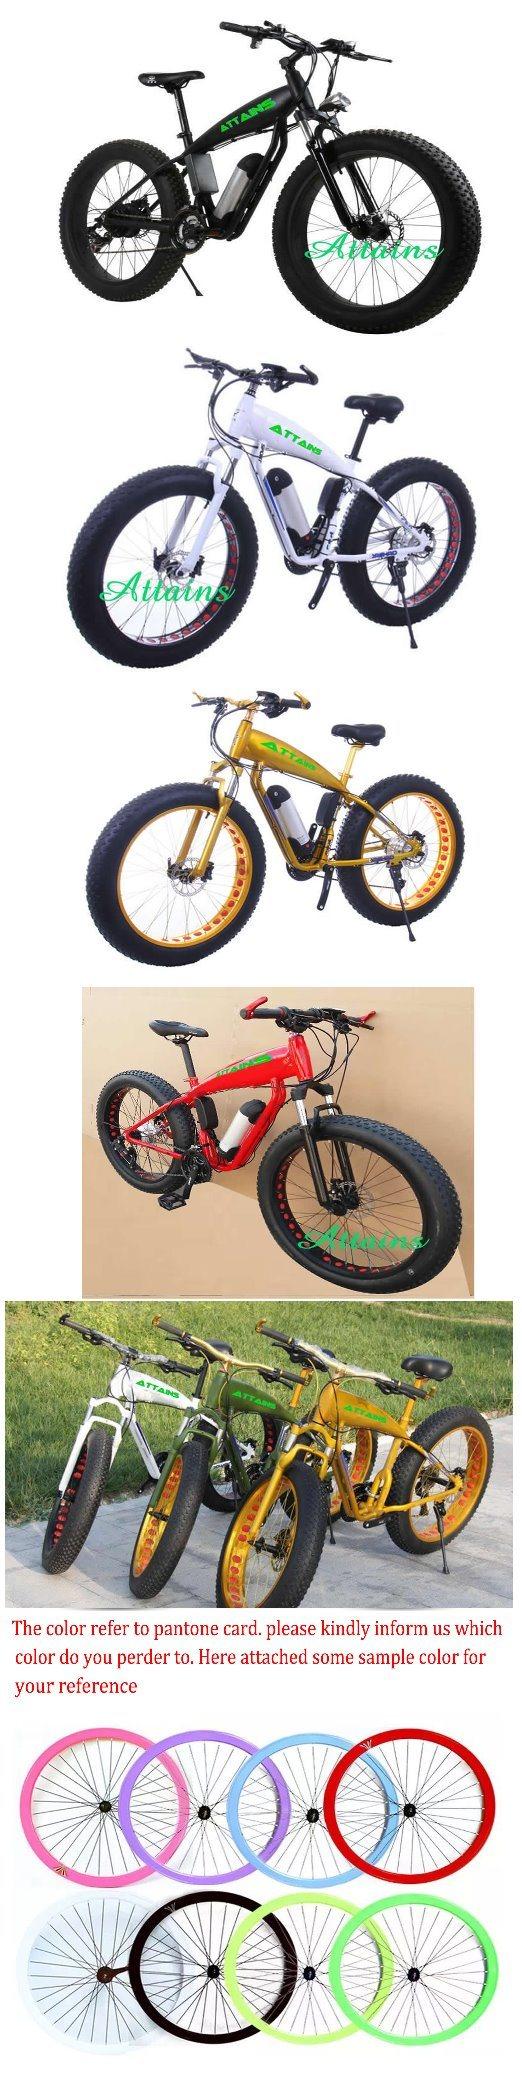 Latest Original Works Fat Tire Electric Dirt Bike